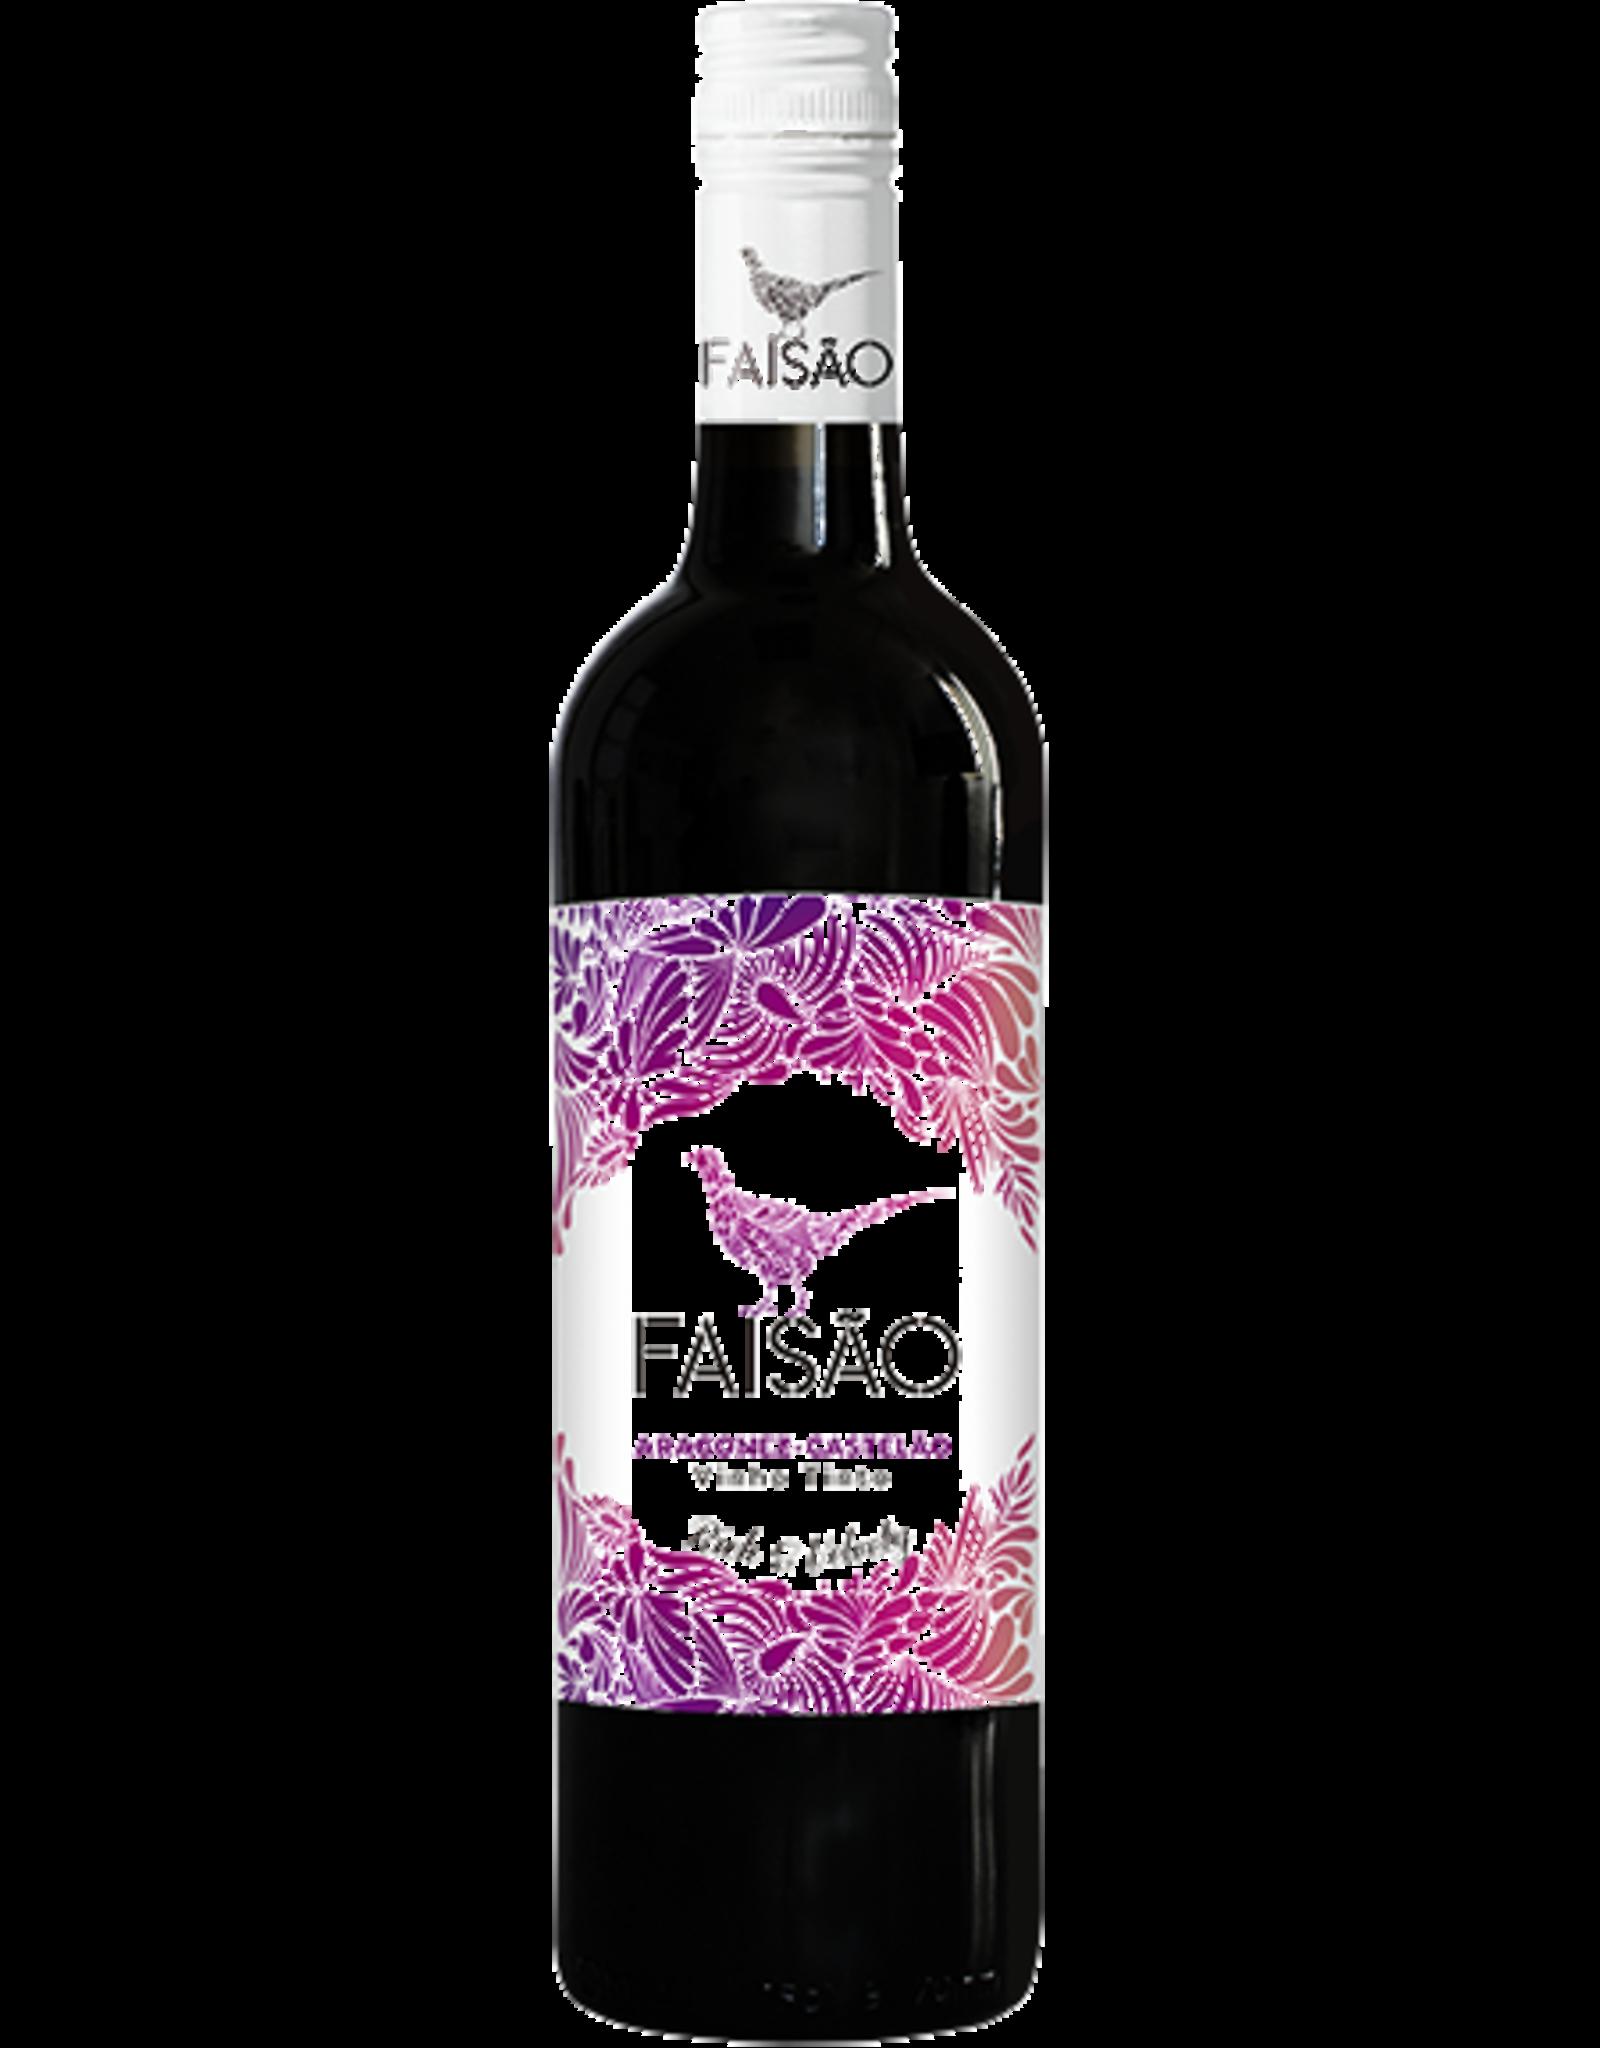 Faisāo Vinho Tinto, Vinho Regional Tejo 2018